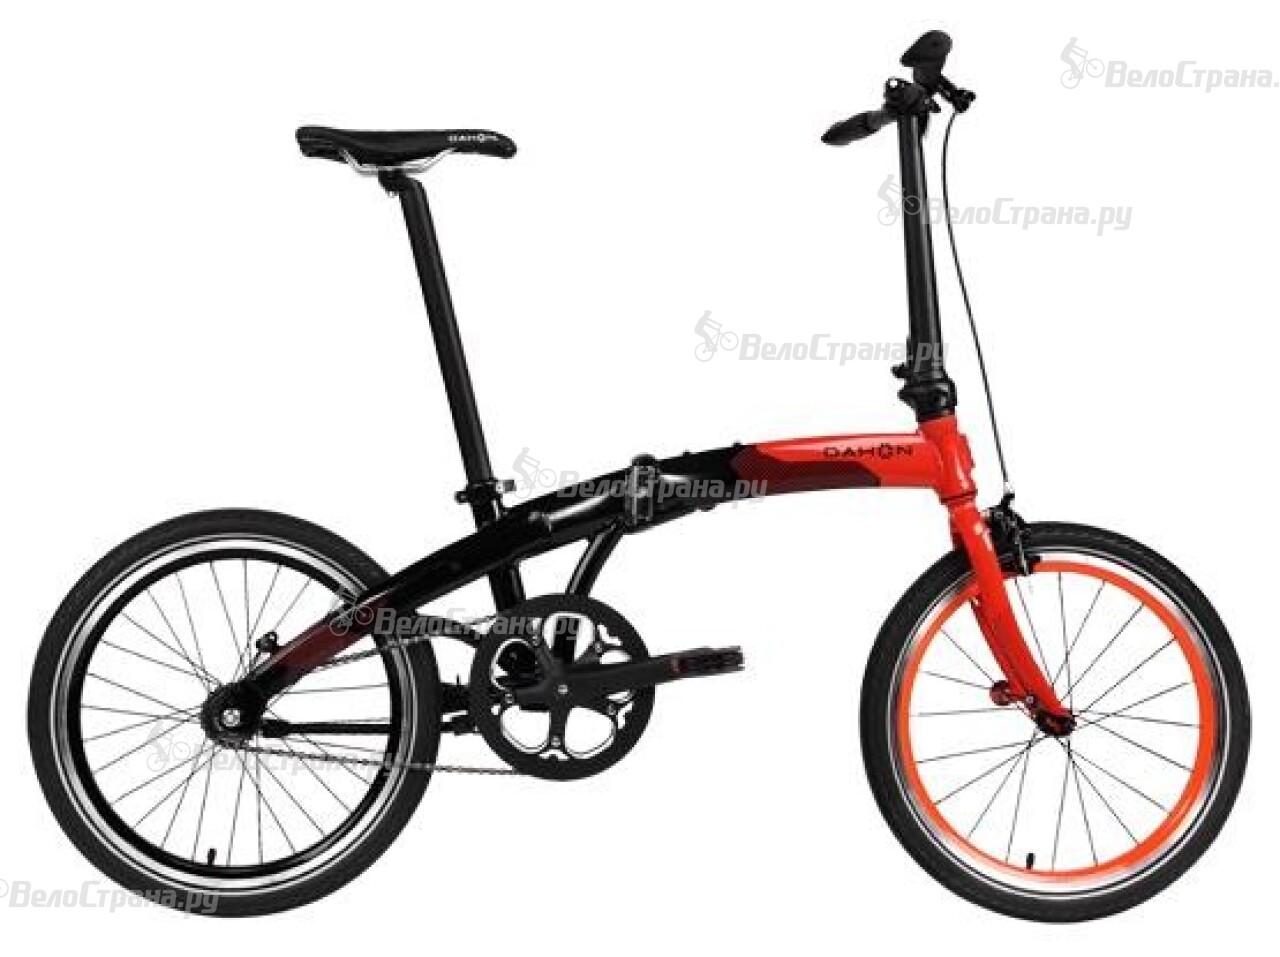 Велосипед Dahon Mu Uno (2014) велосипед dahon ciao d7 2014